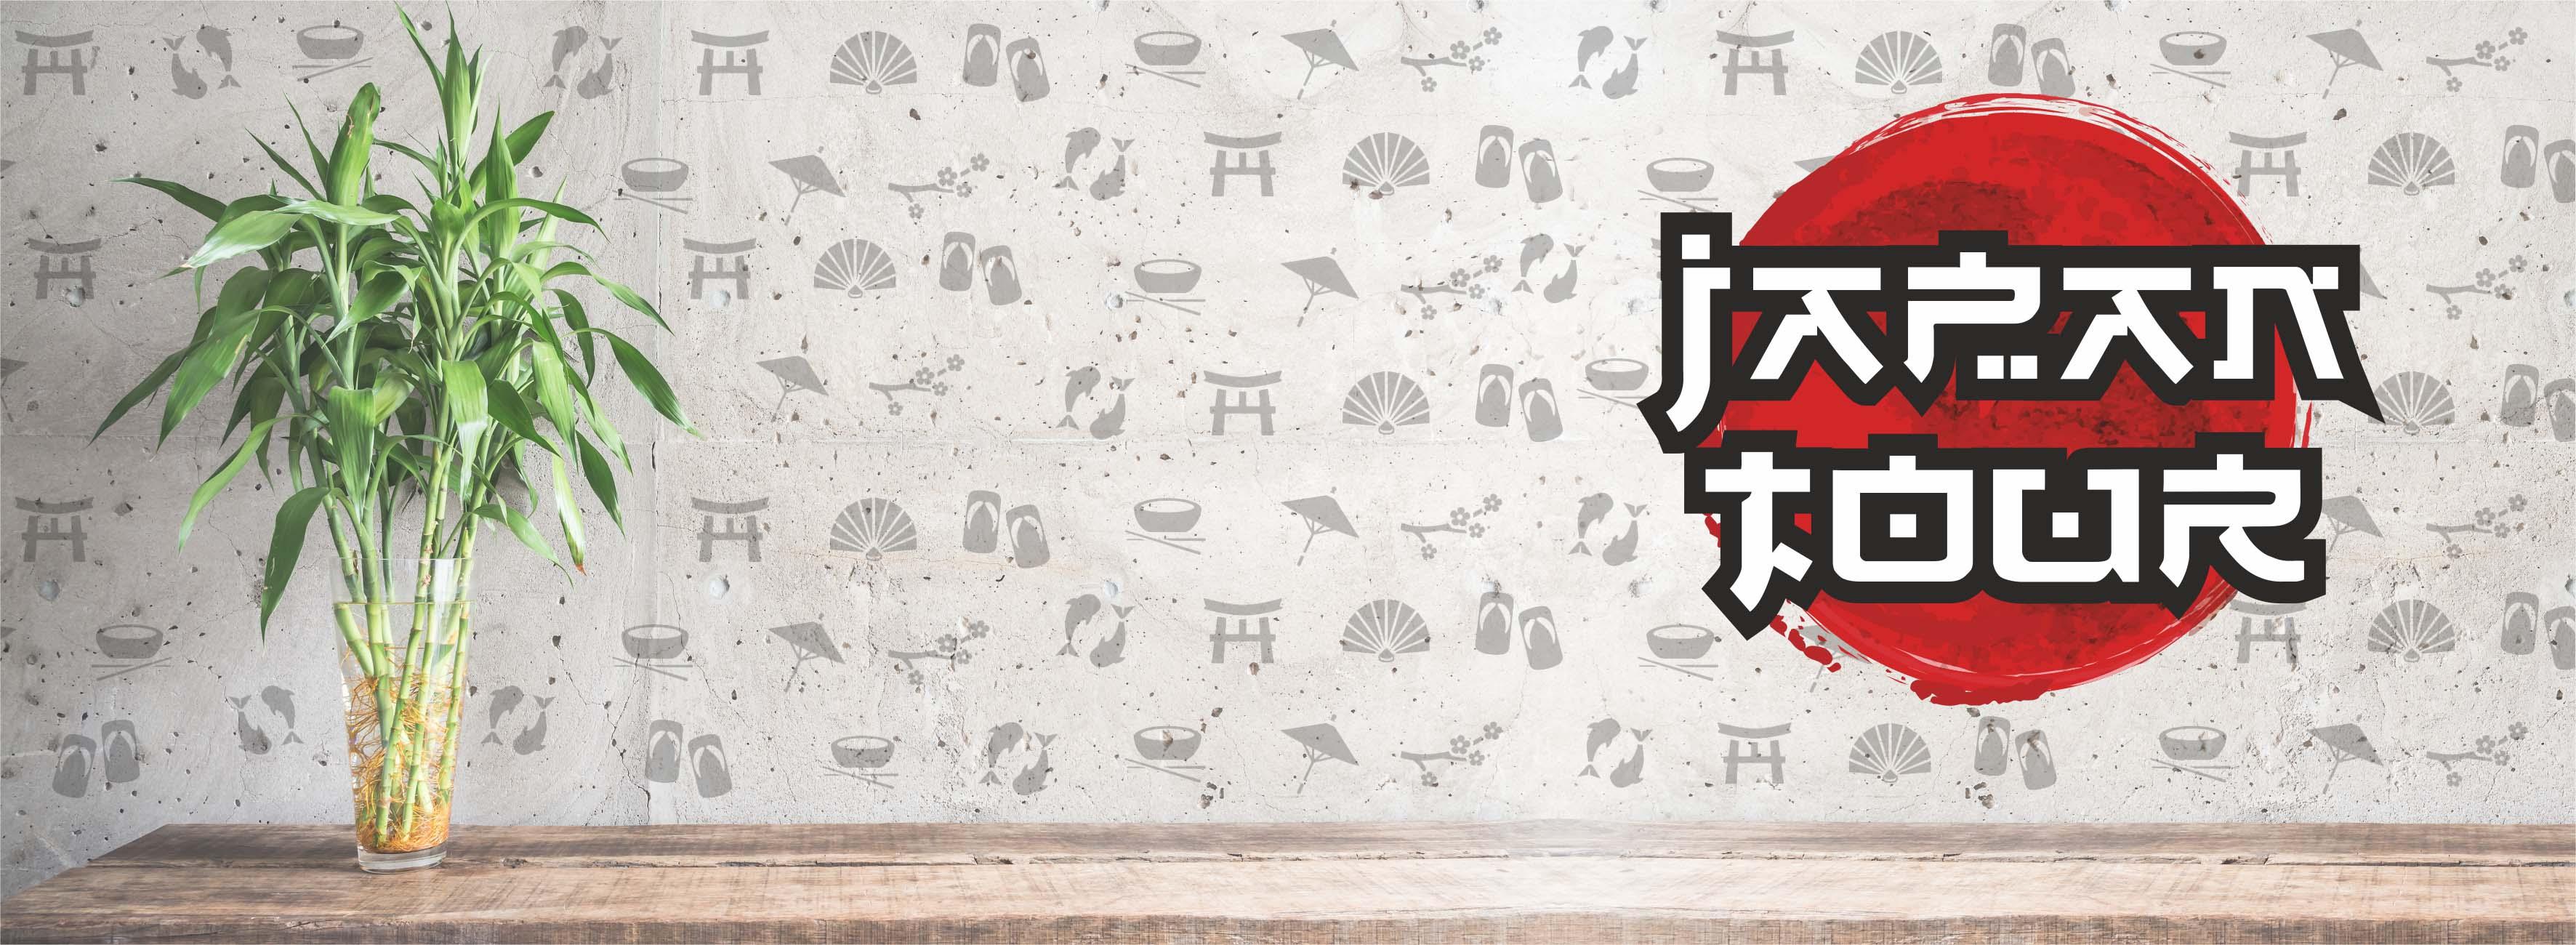 Обложки в соц. сети для тур. оператора по Японии фото f_97959b8491a88e24.jpg